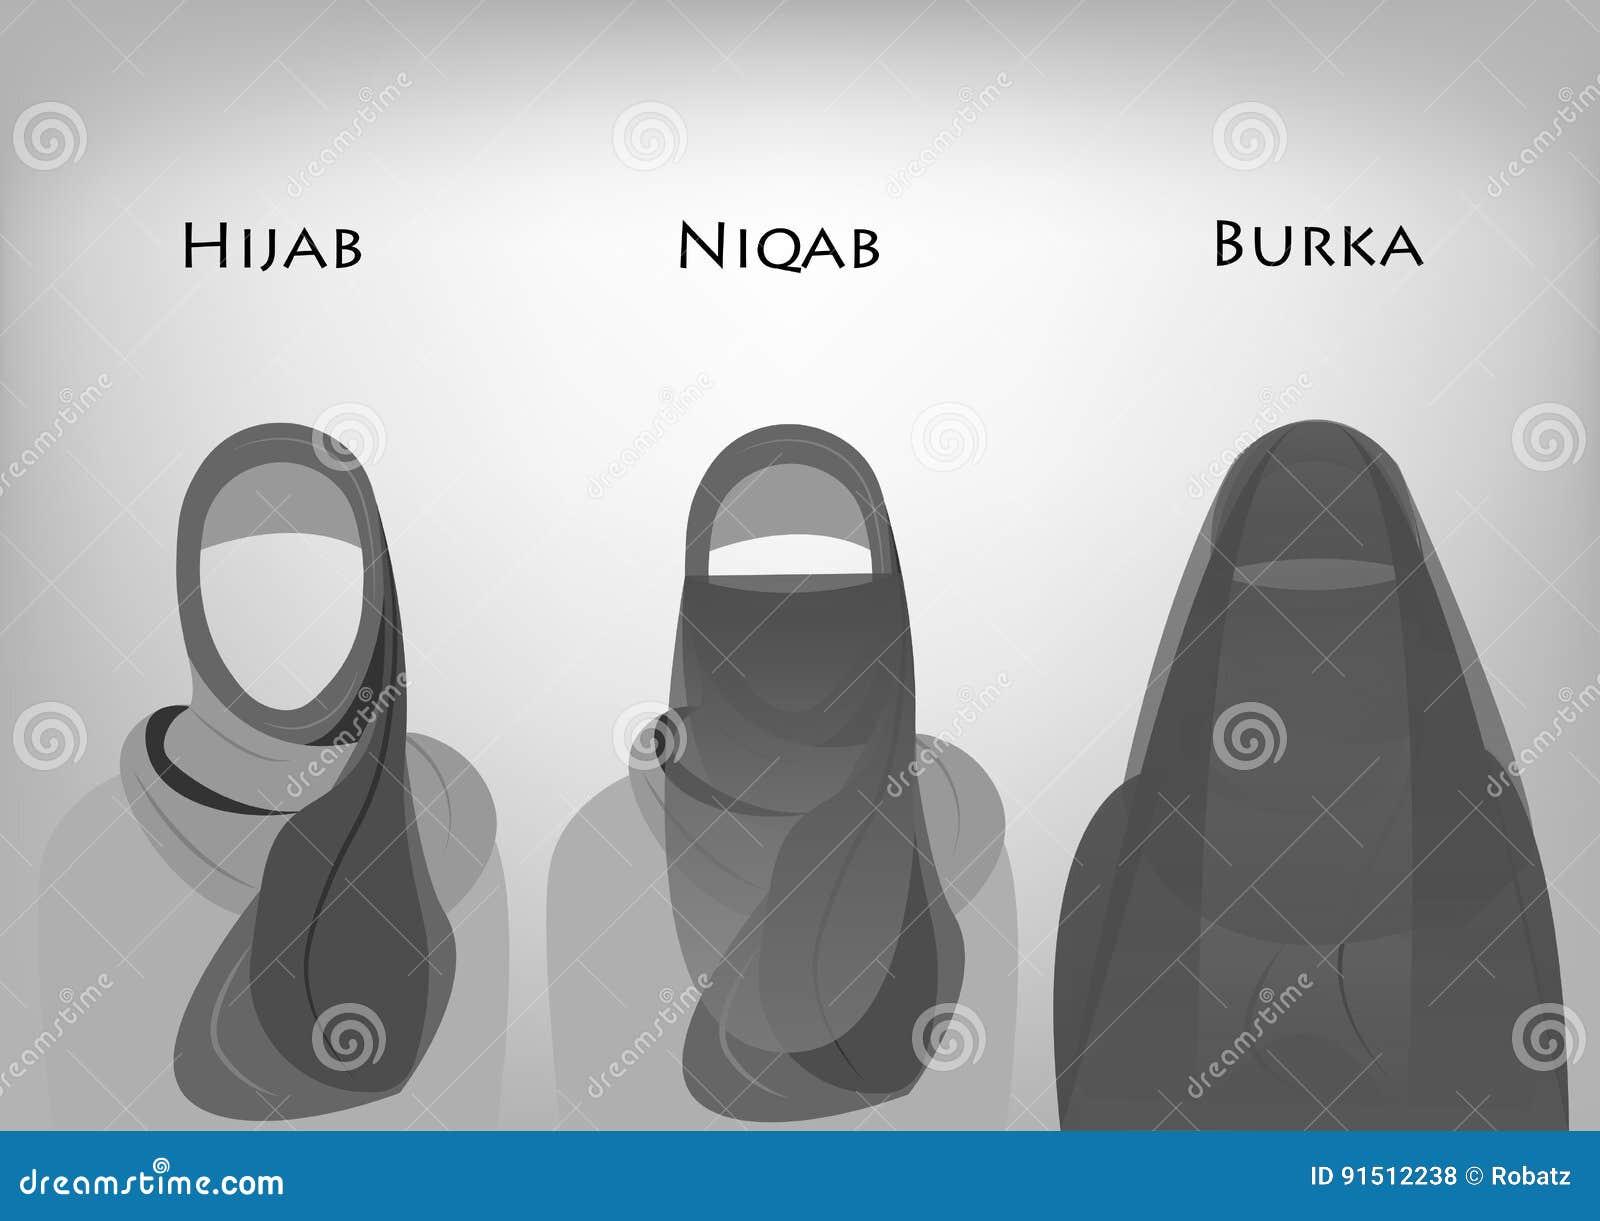 German authorities, politicians divided on niqab, burqa ban